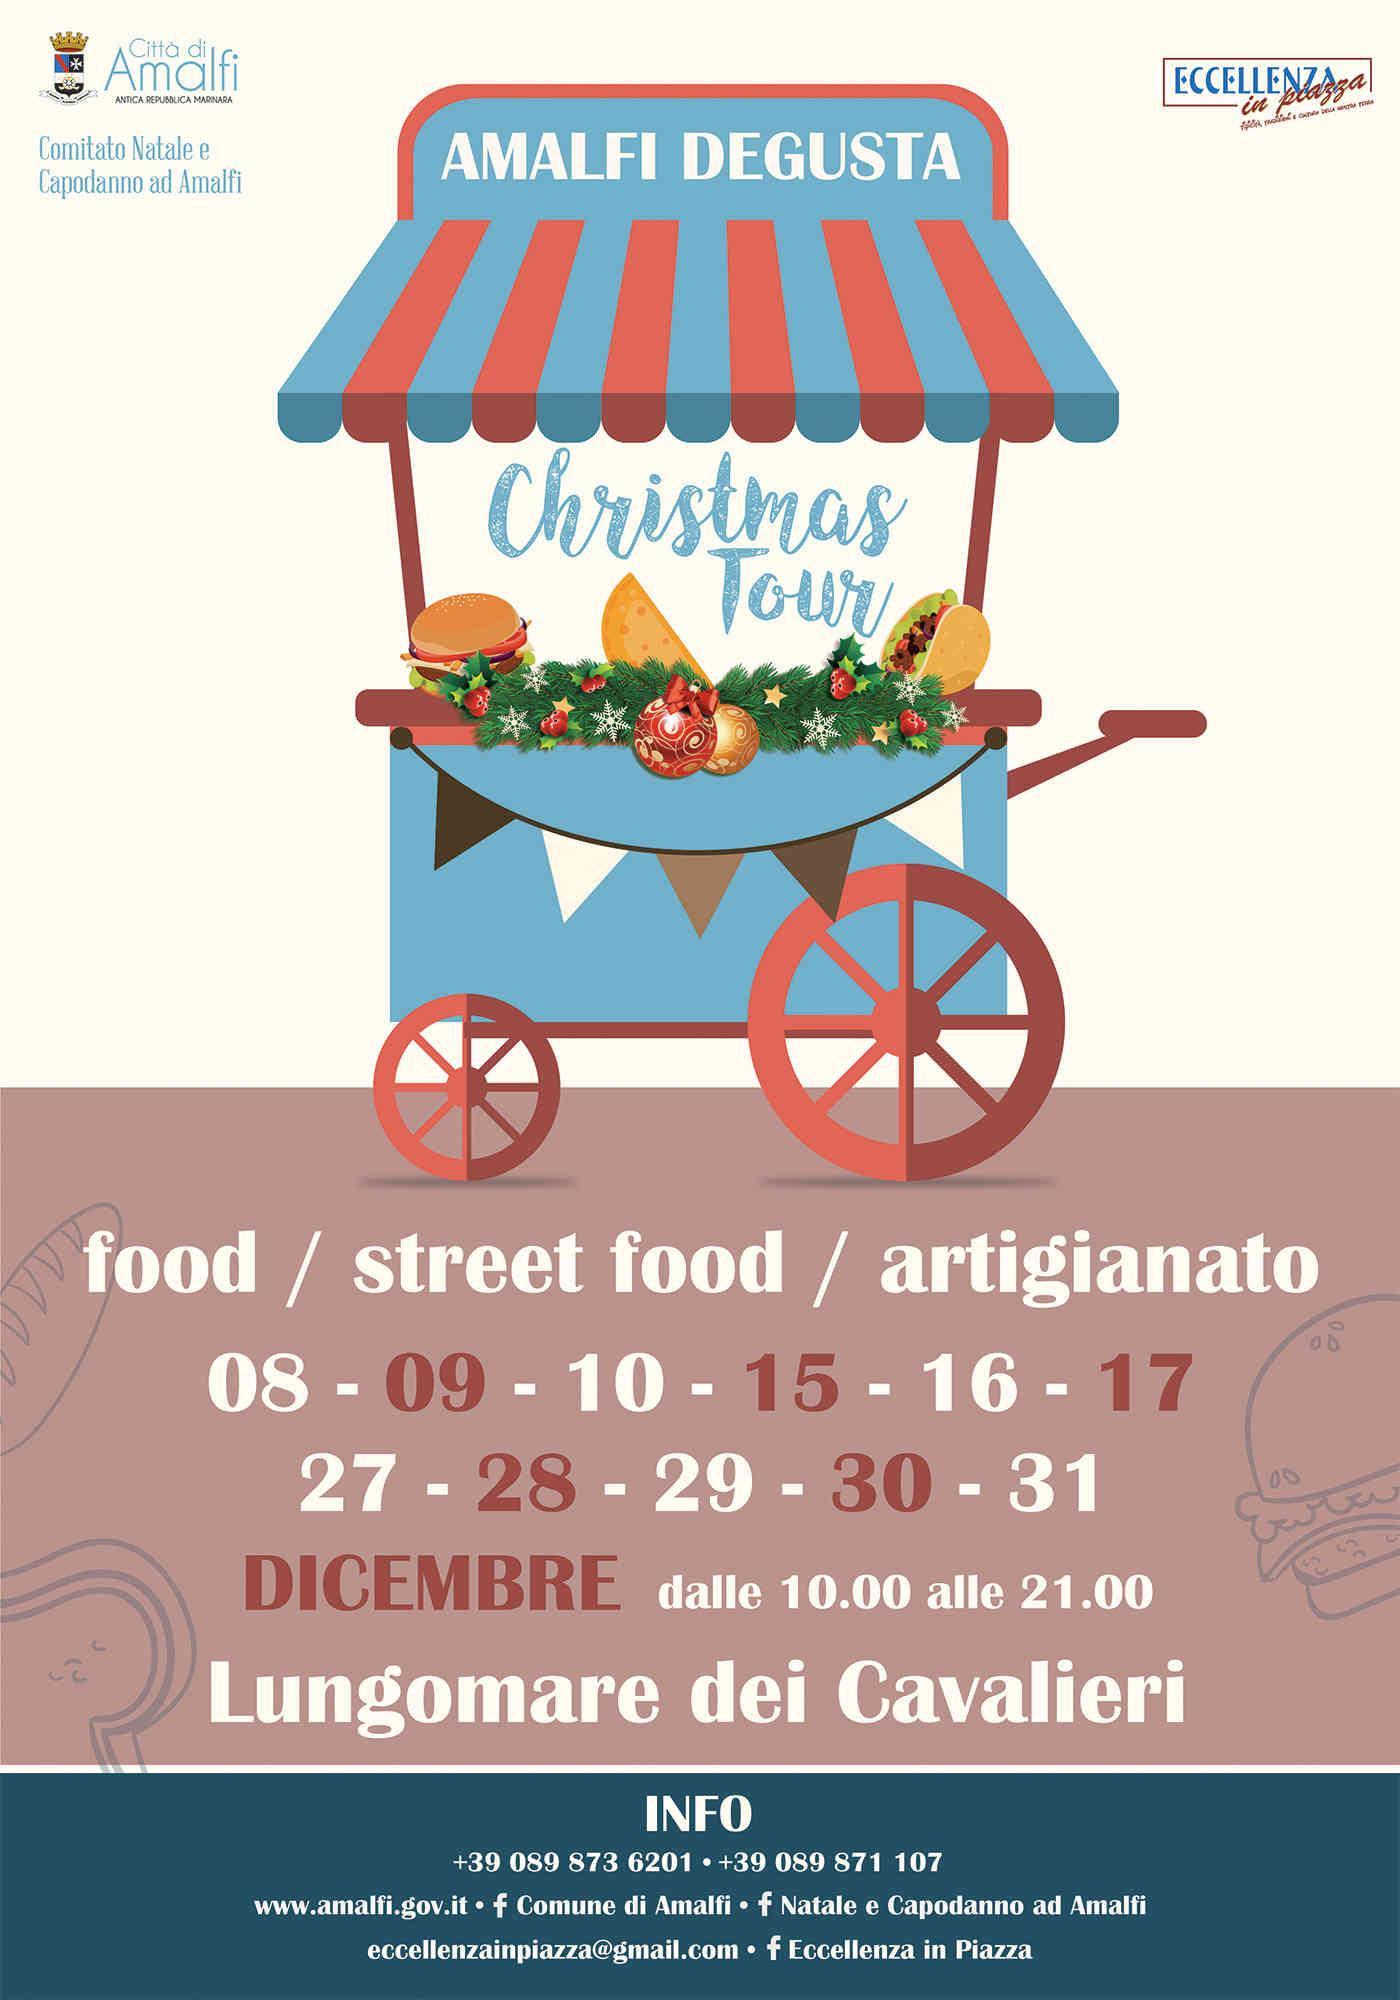 Amalfi Degusta – Food e Street Food Christmas Tour